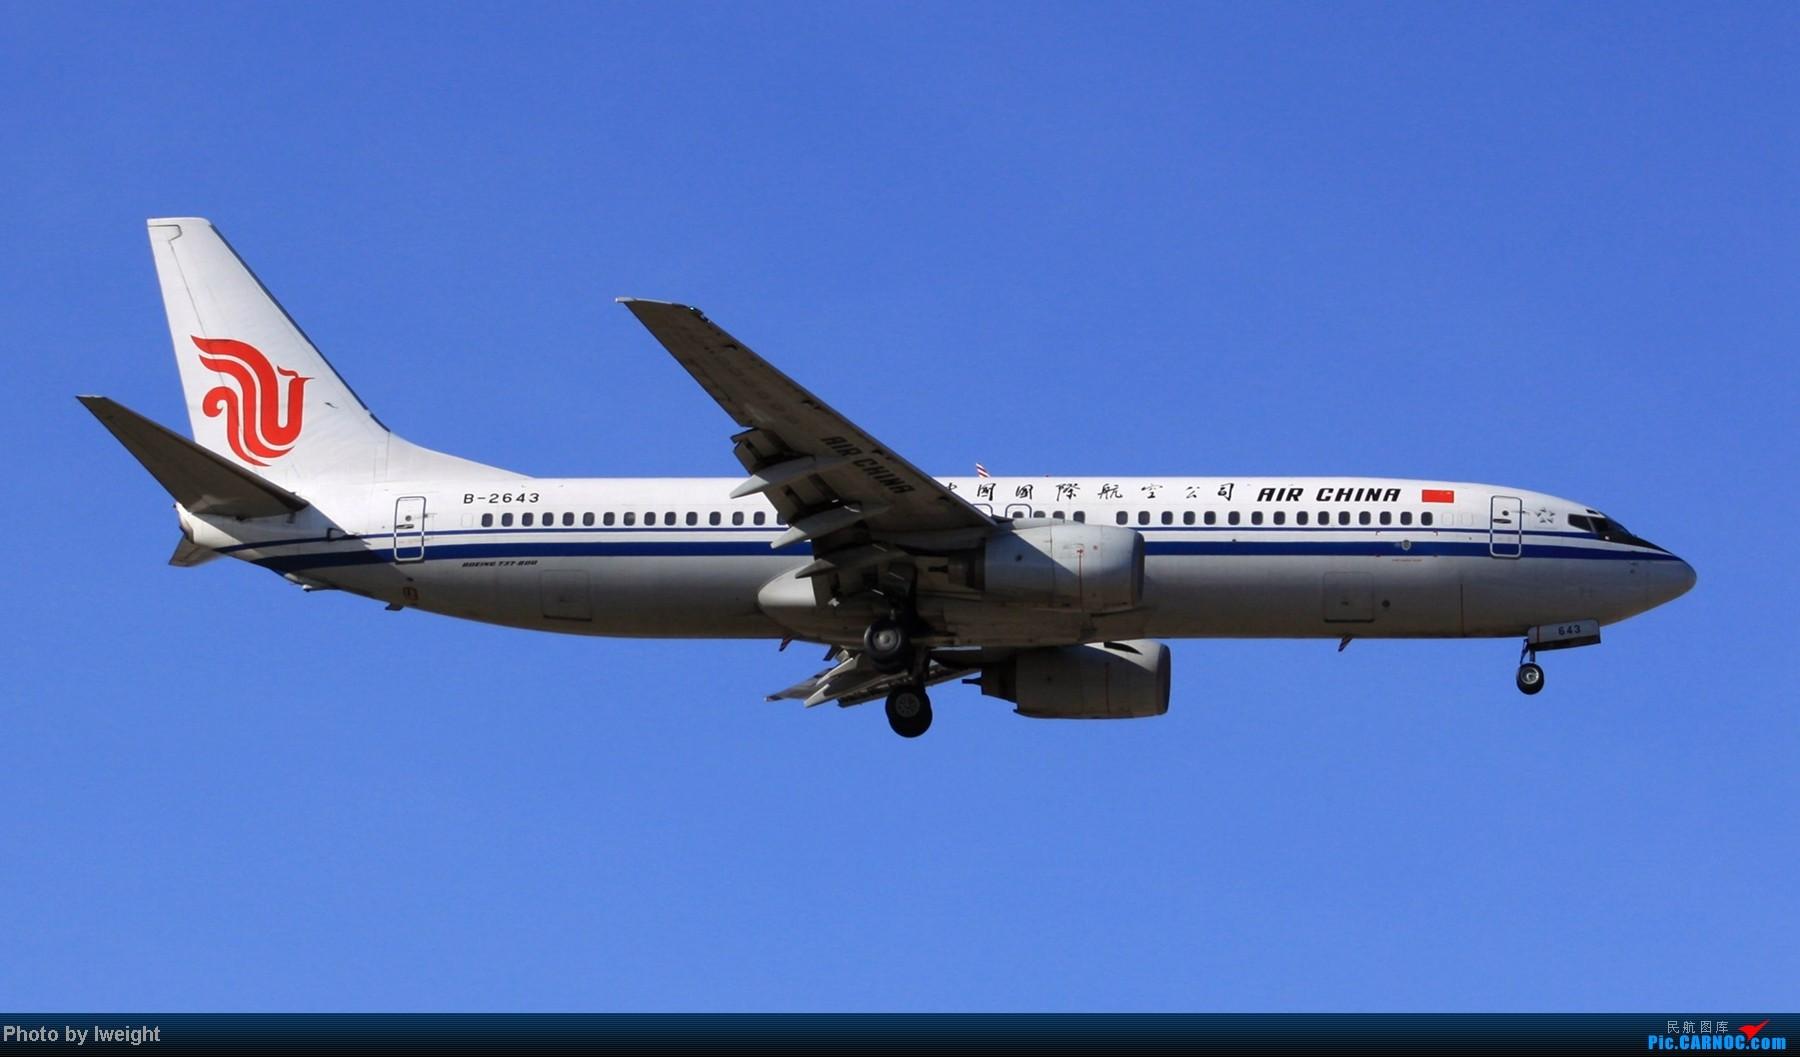 Re:[原创]春节期间首都机场拍机汇报 BOEING 737-800 B-2643 中国北京首都机场